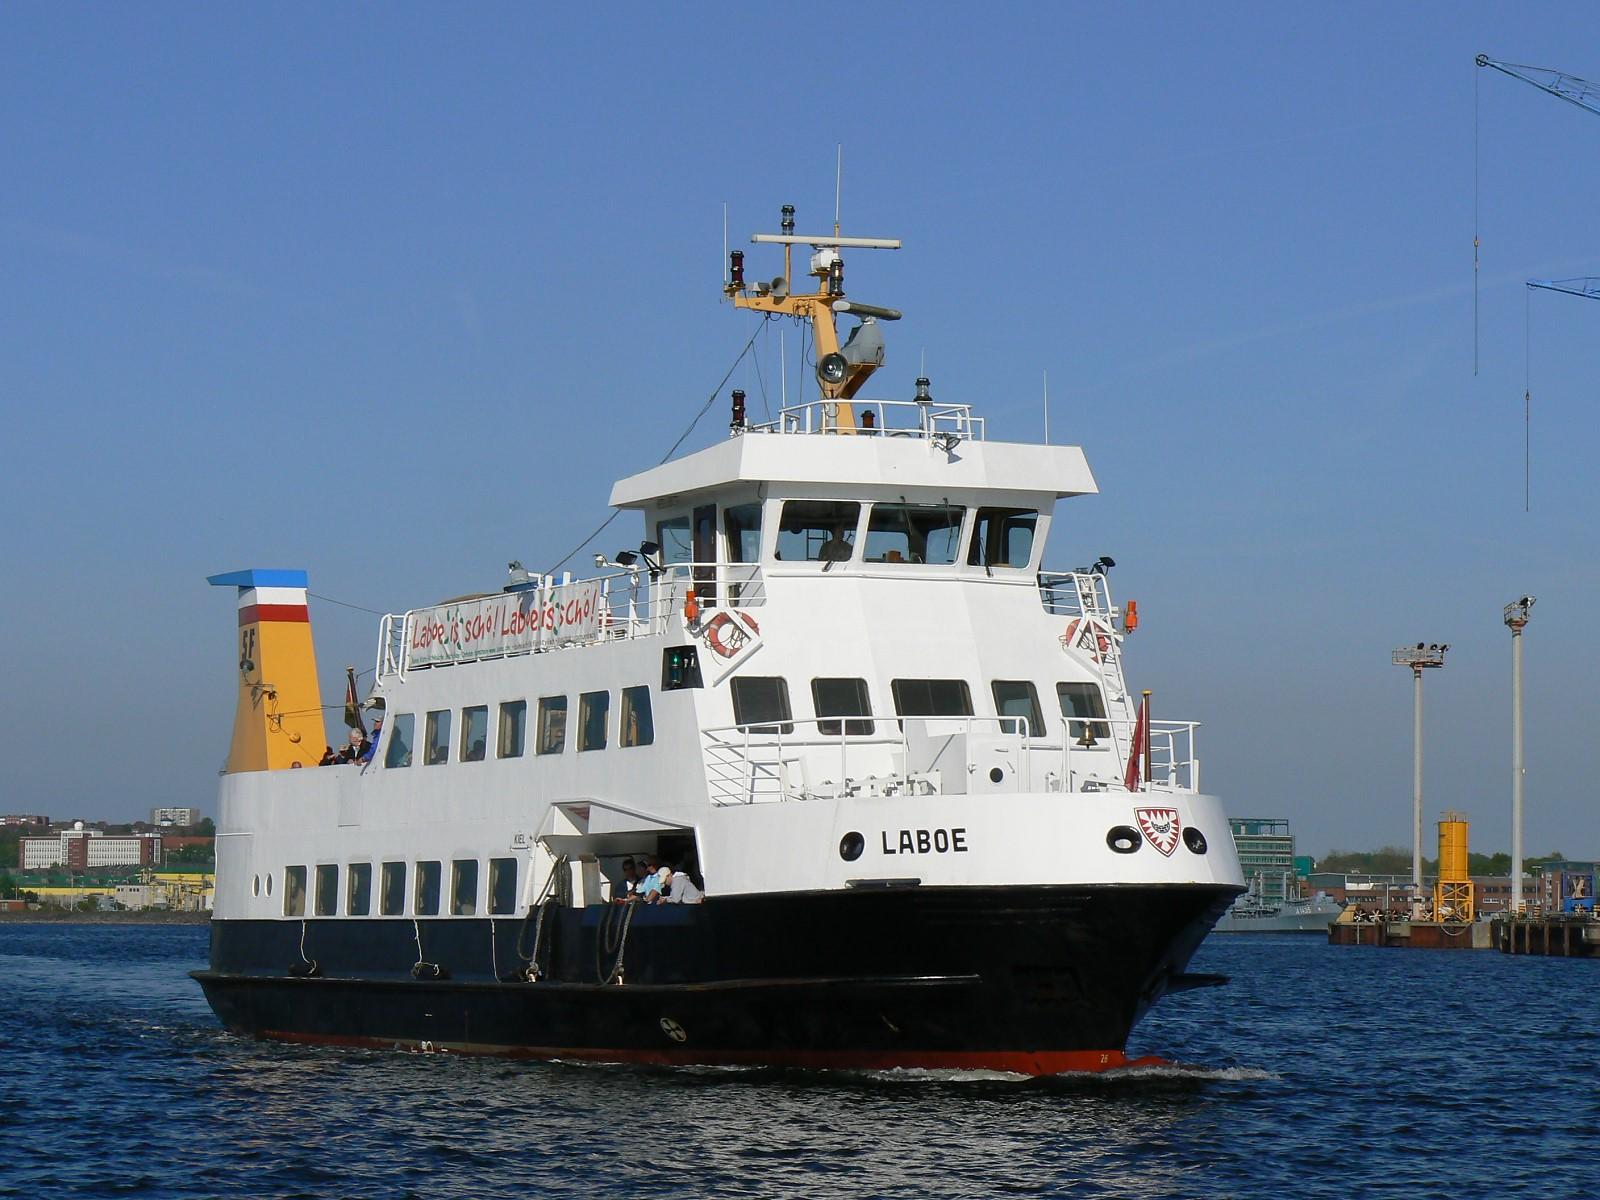 File:SFK MS Laboe Fahrgastschiff.jpg - Wikimedia Commons